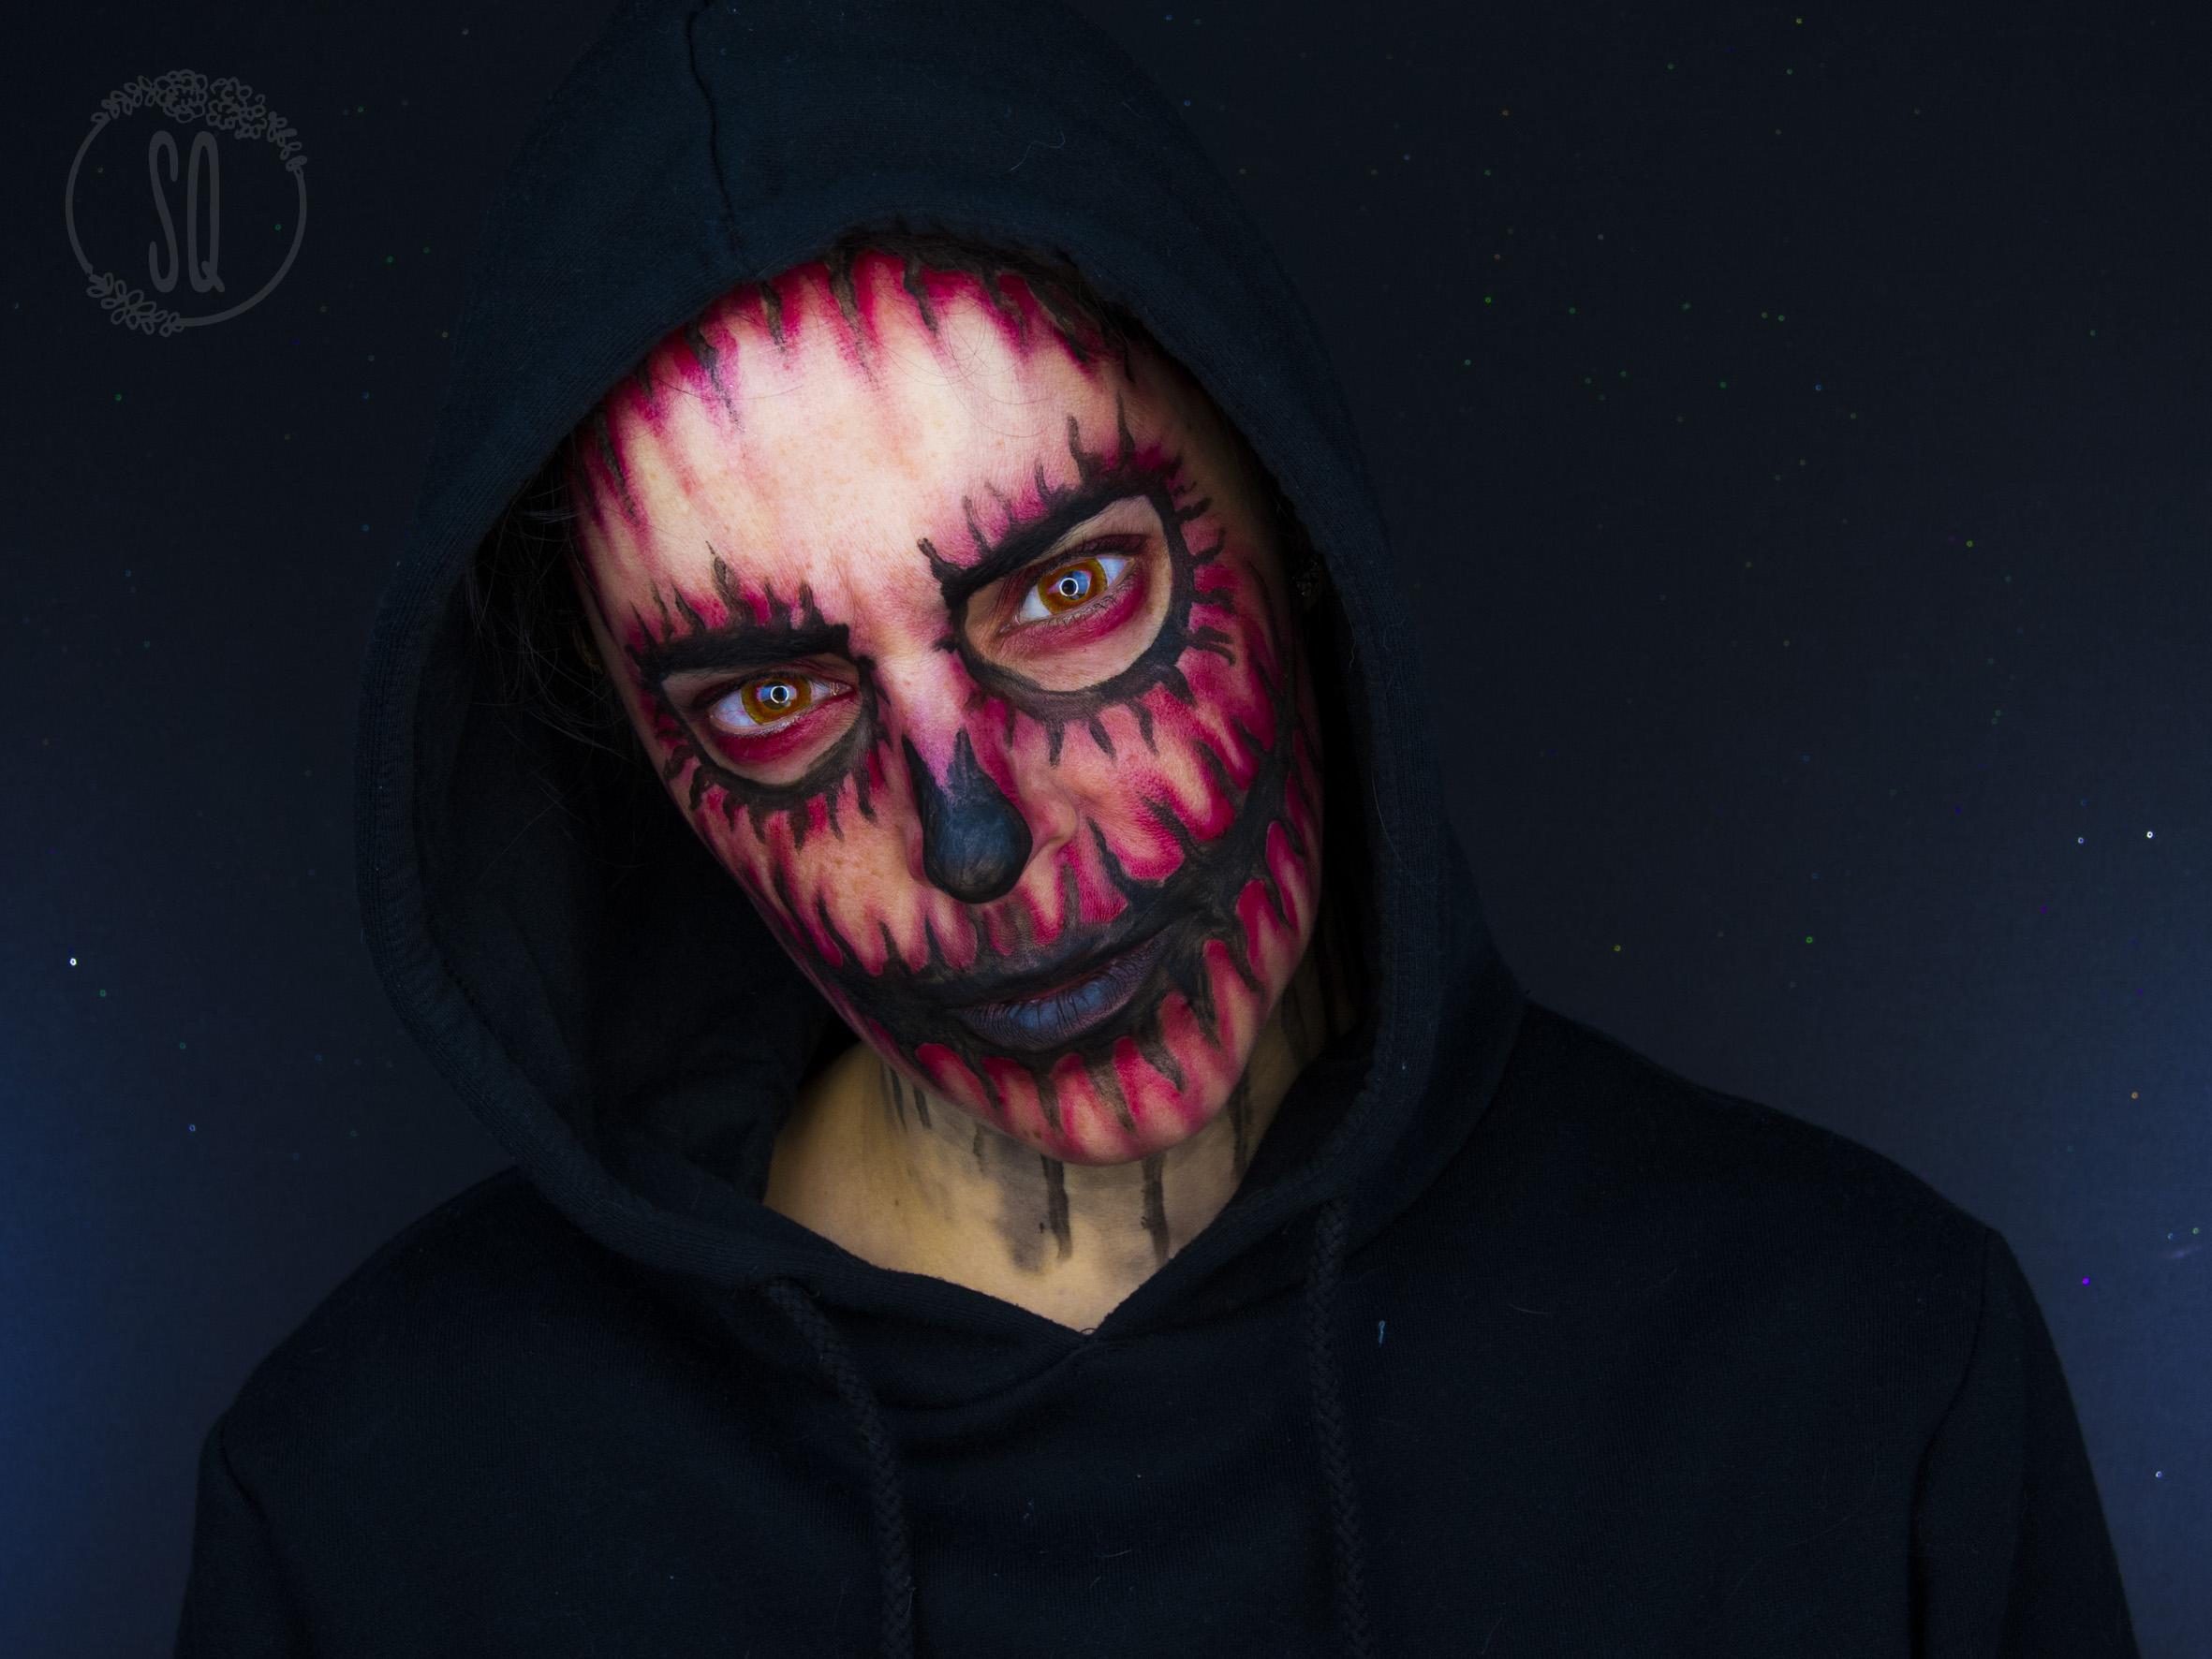 maquillaje calavera demonio para halloween maquillaje calavera demonio para halloween - Maquillaje Demonio